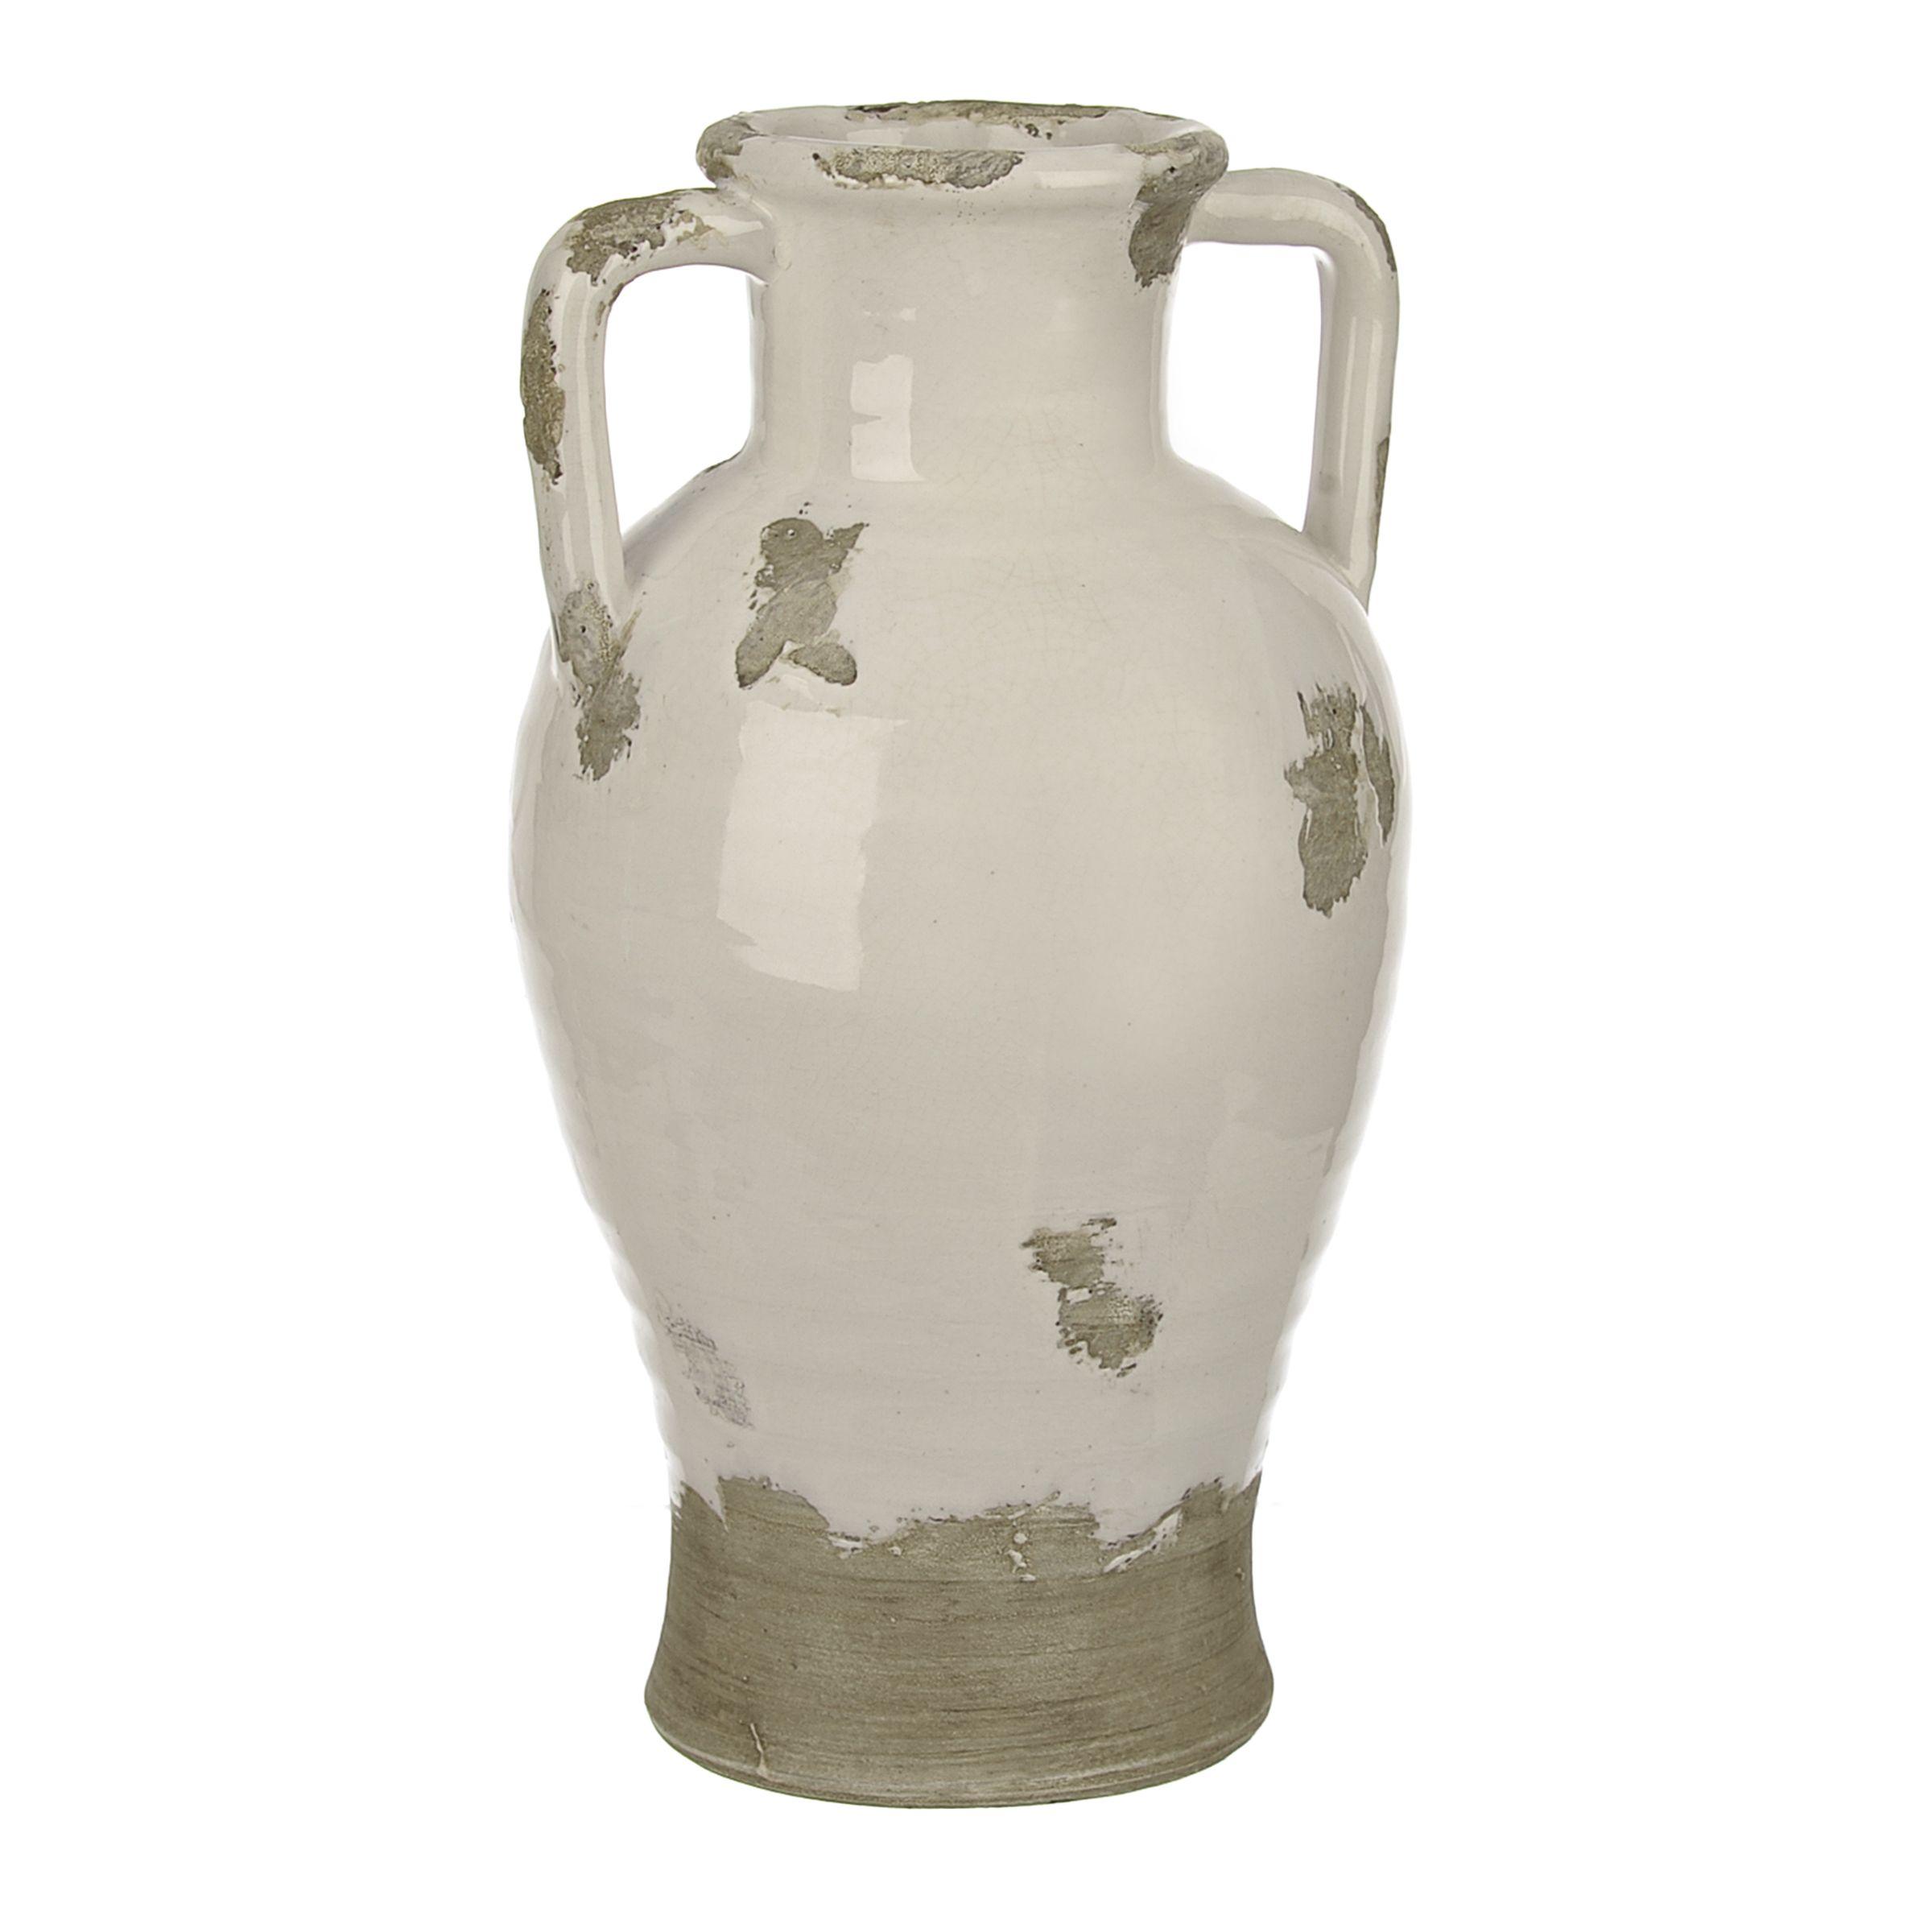 Distressed White Ceramic Jug Vase In 2019 Modern Farmhouse White